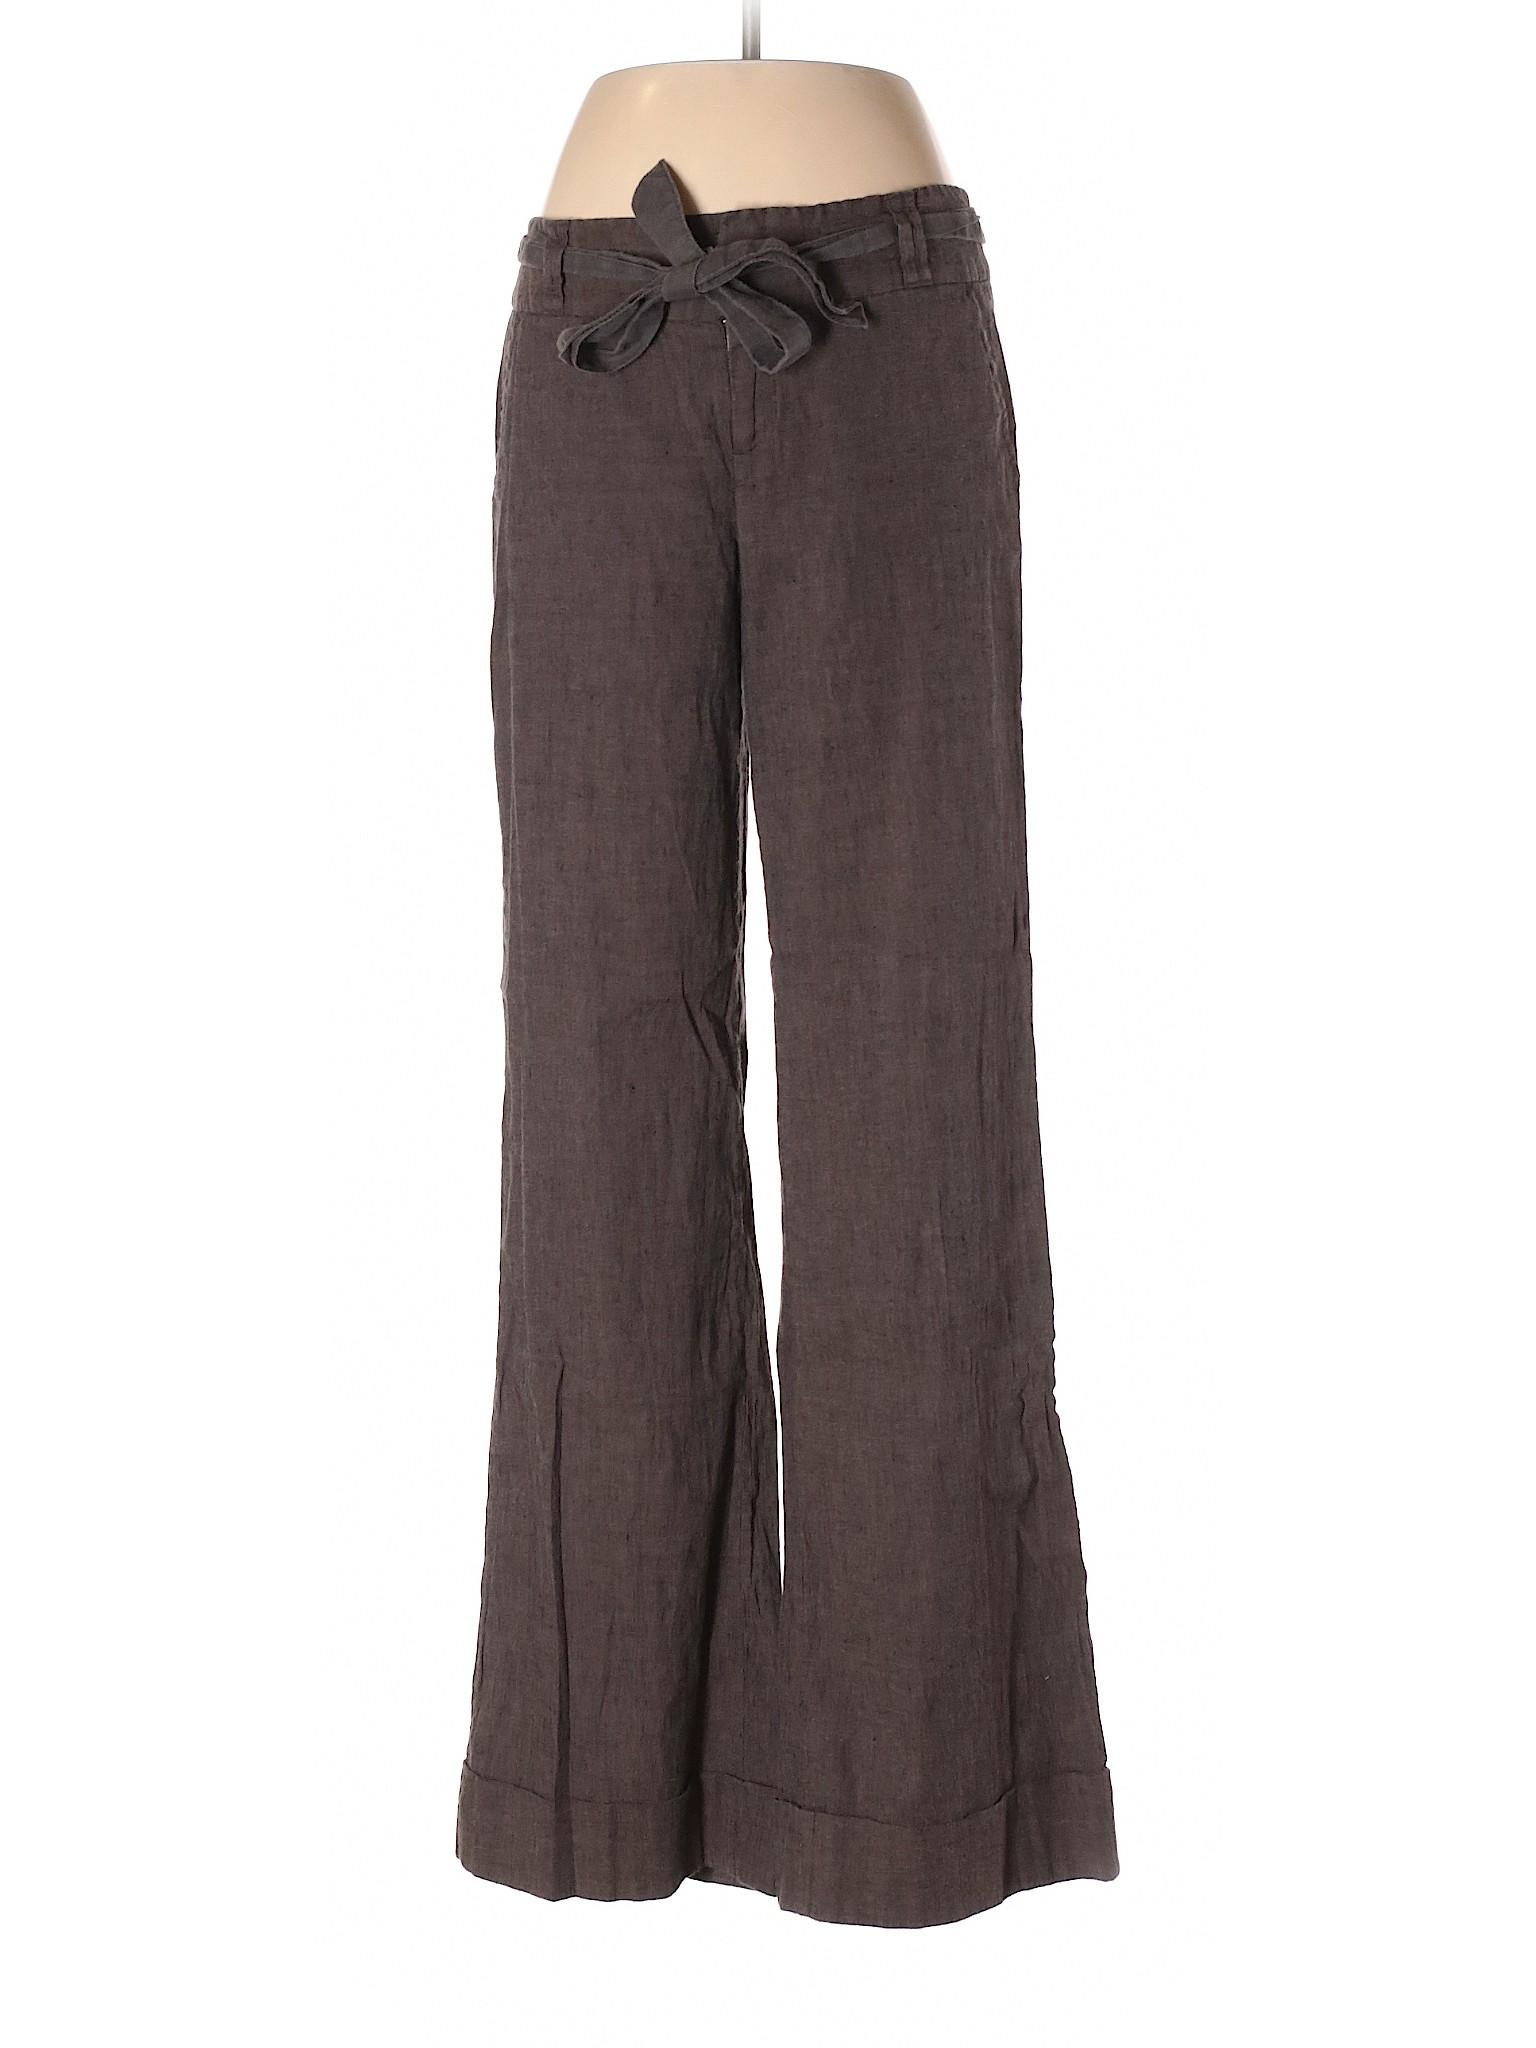 Republic Boutique leisure Linen Pants Banana wp4HqxHvA